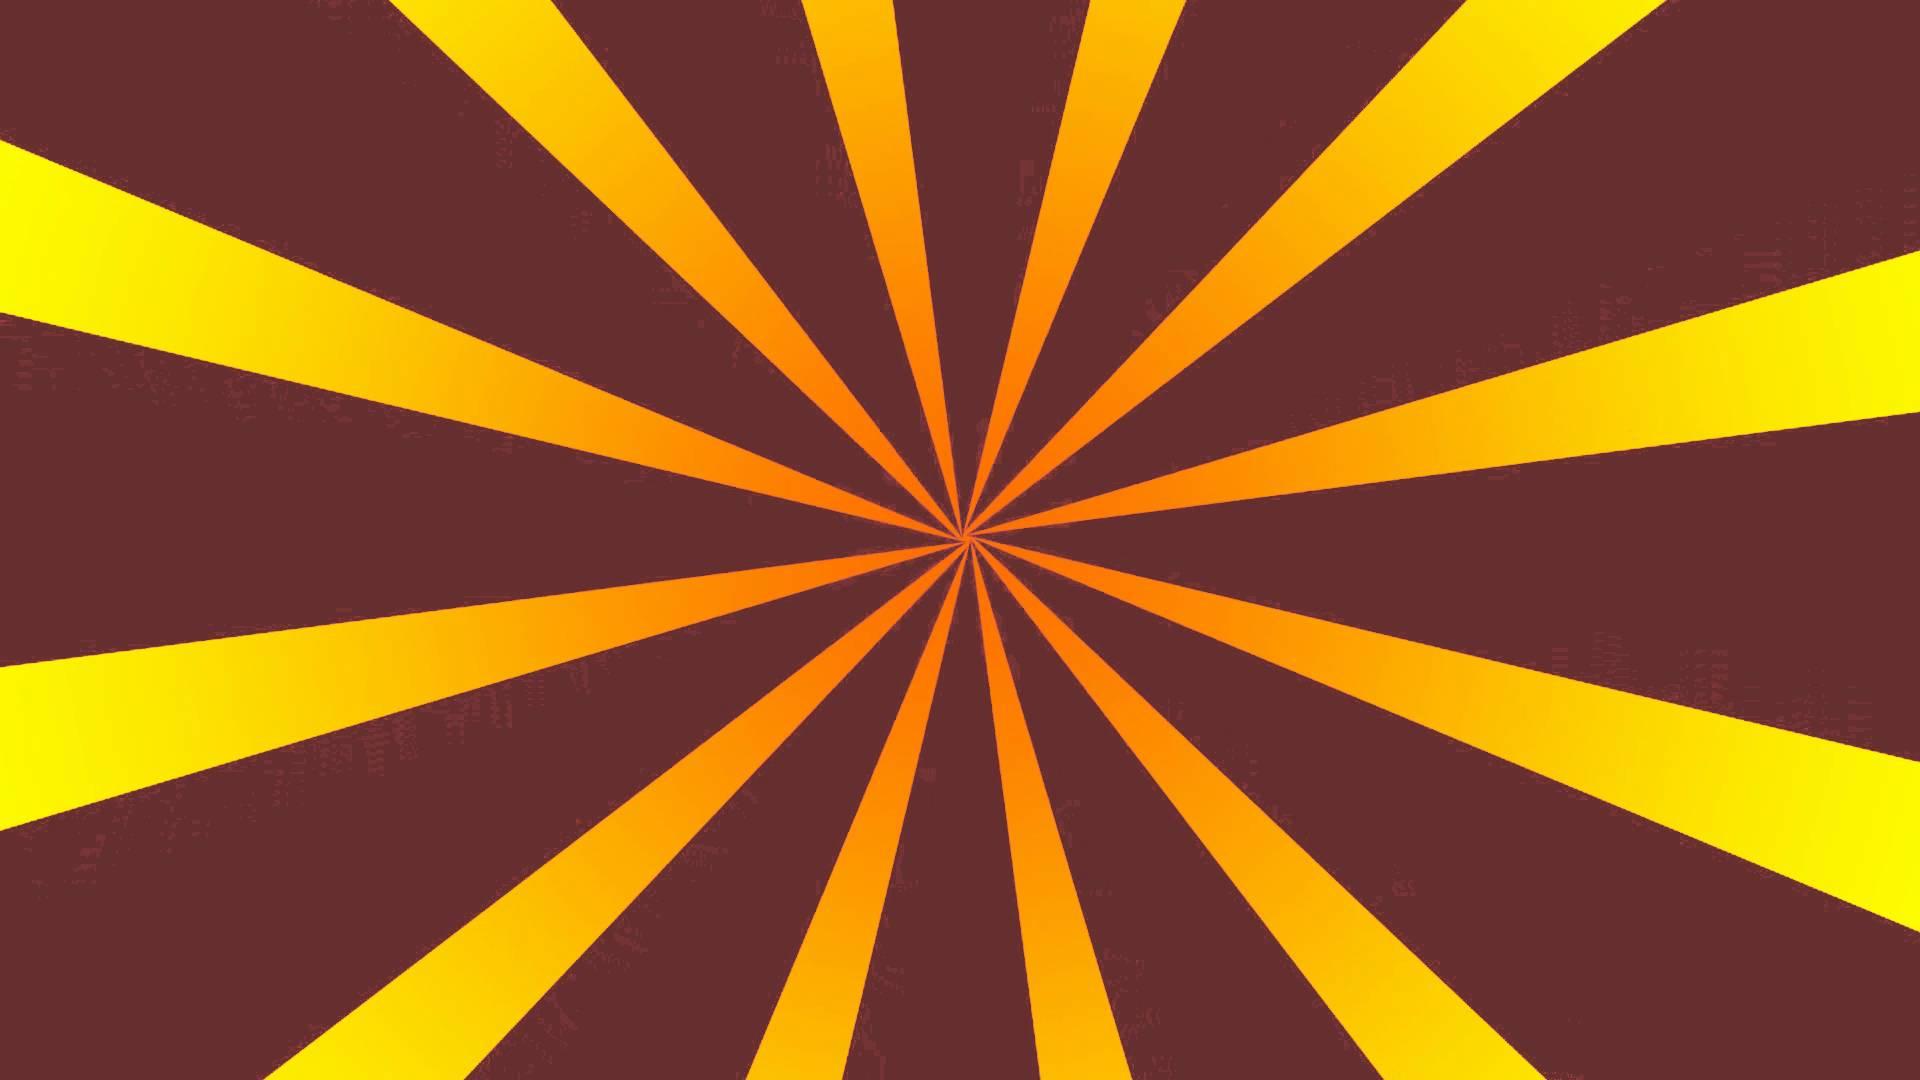 GFX Animation Rotation Background Red Orange 1920x1080